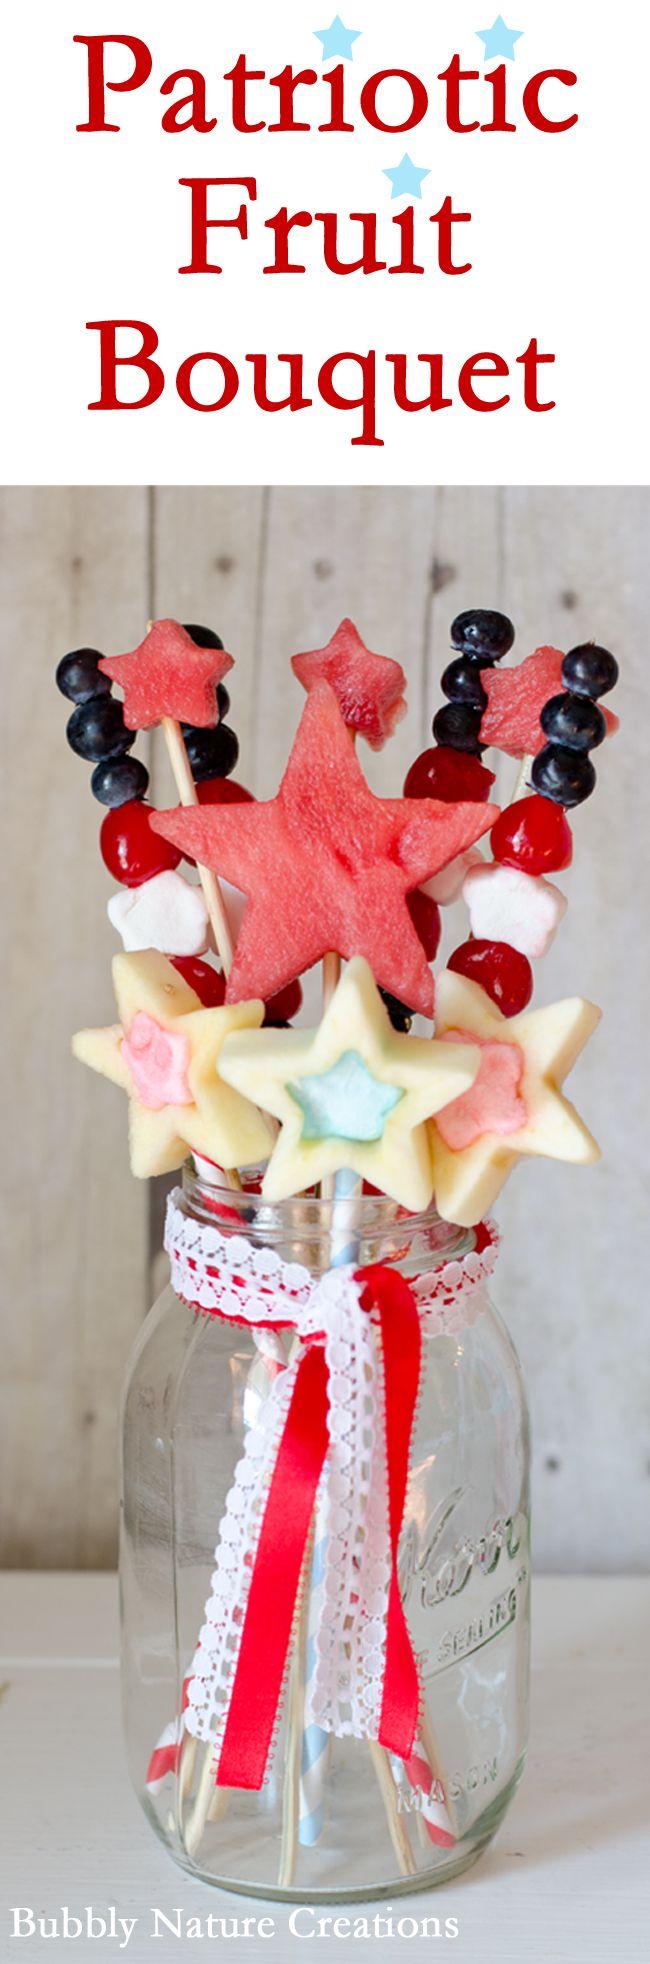 Best 121 Fruit bouquet images on Pinterest   Basket of fruit, Edible ...